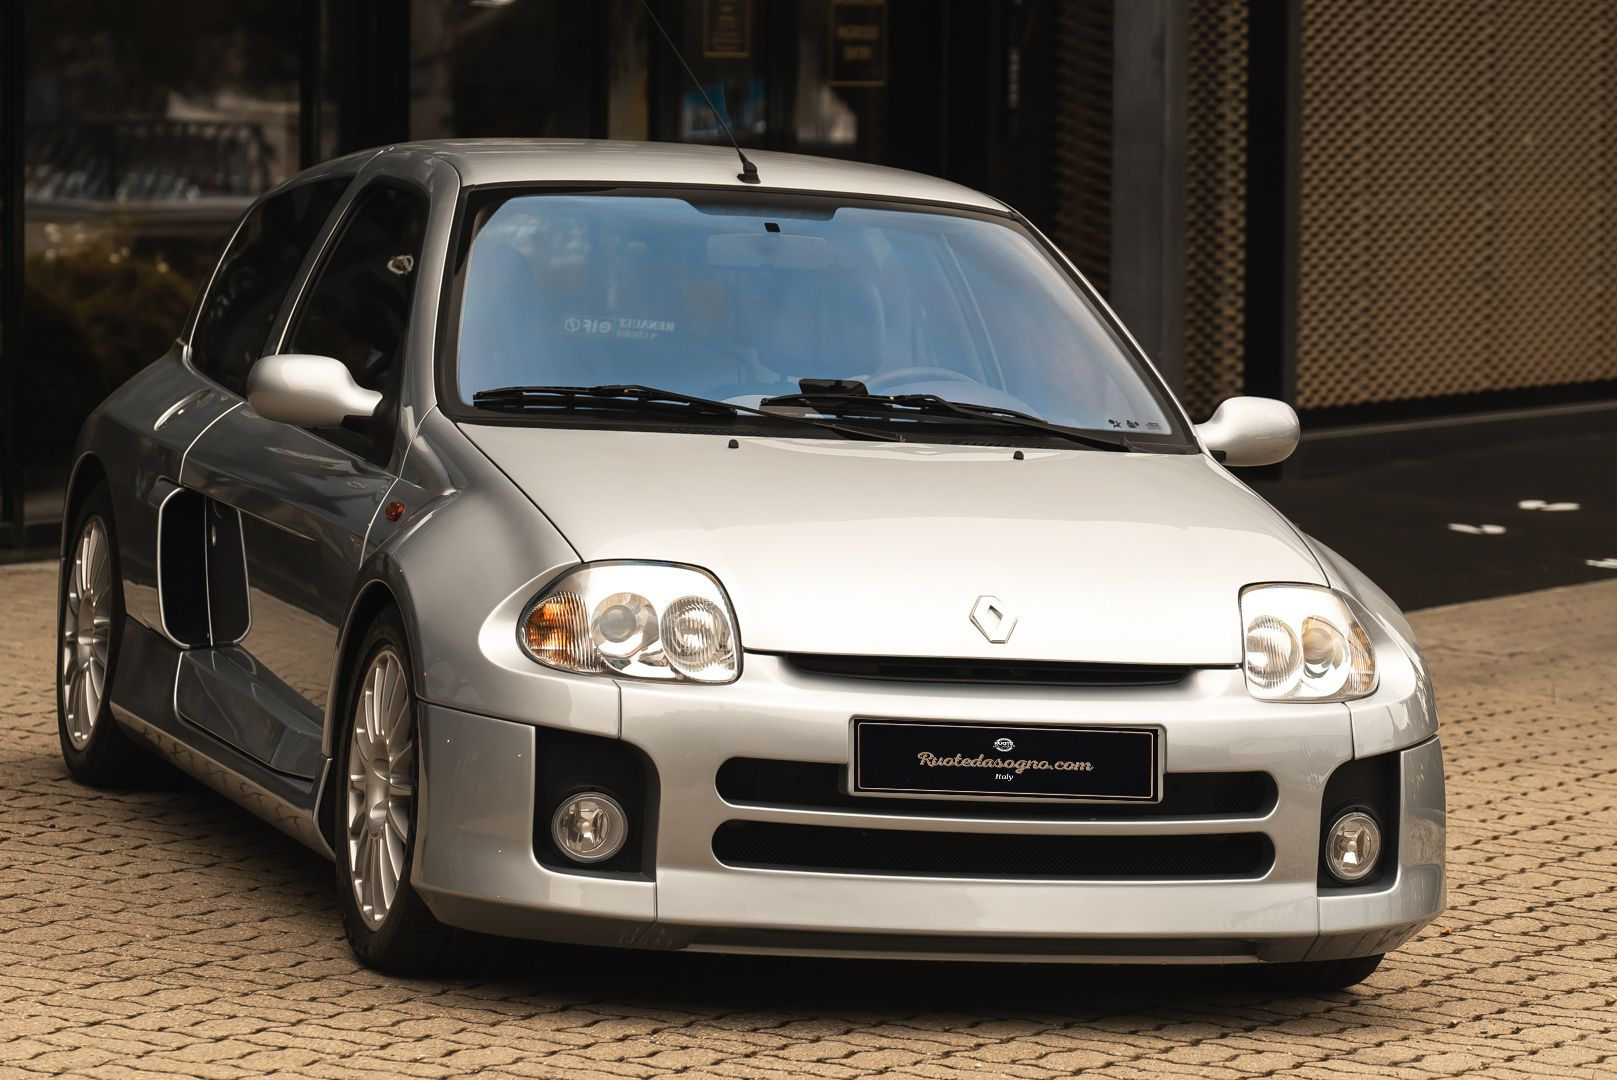 2002 Renault Clio 3.0 V6 Renault Sport Phase1 84915